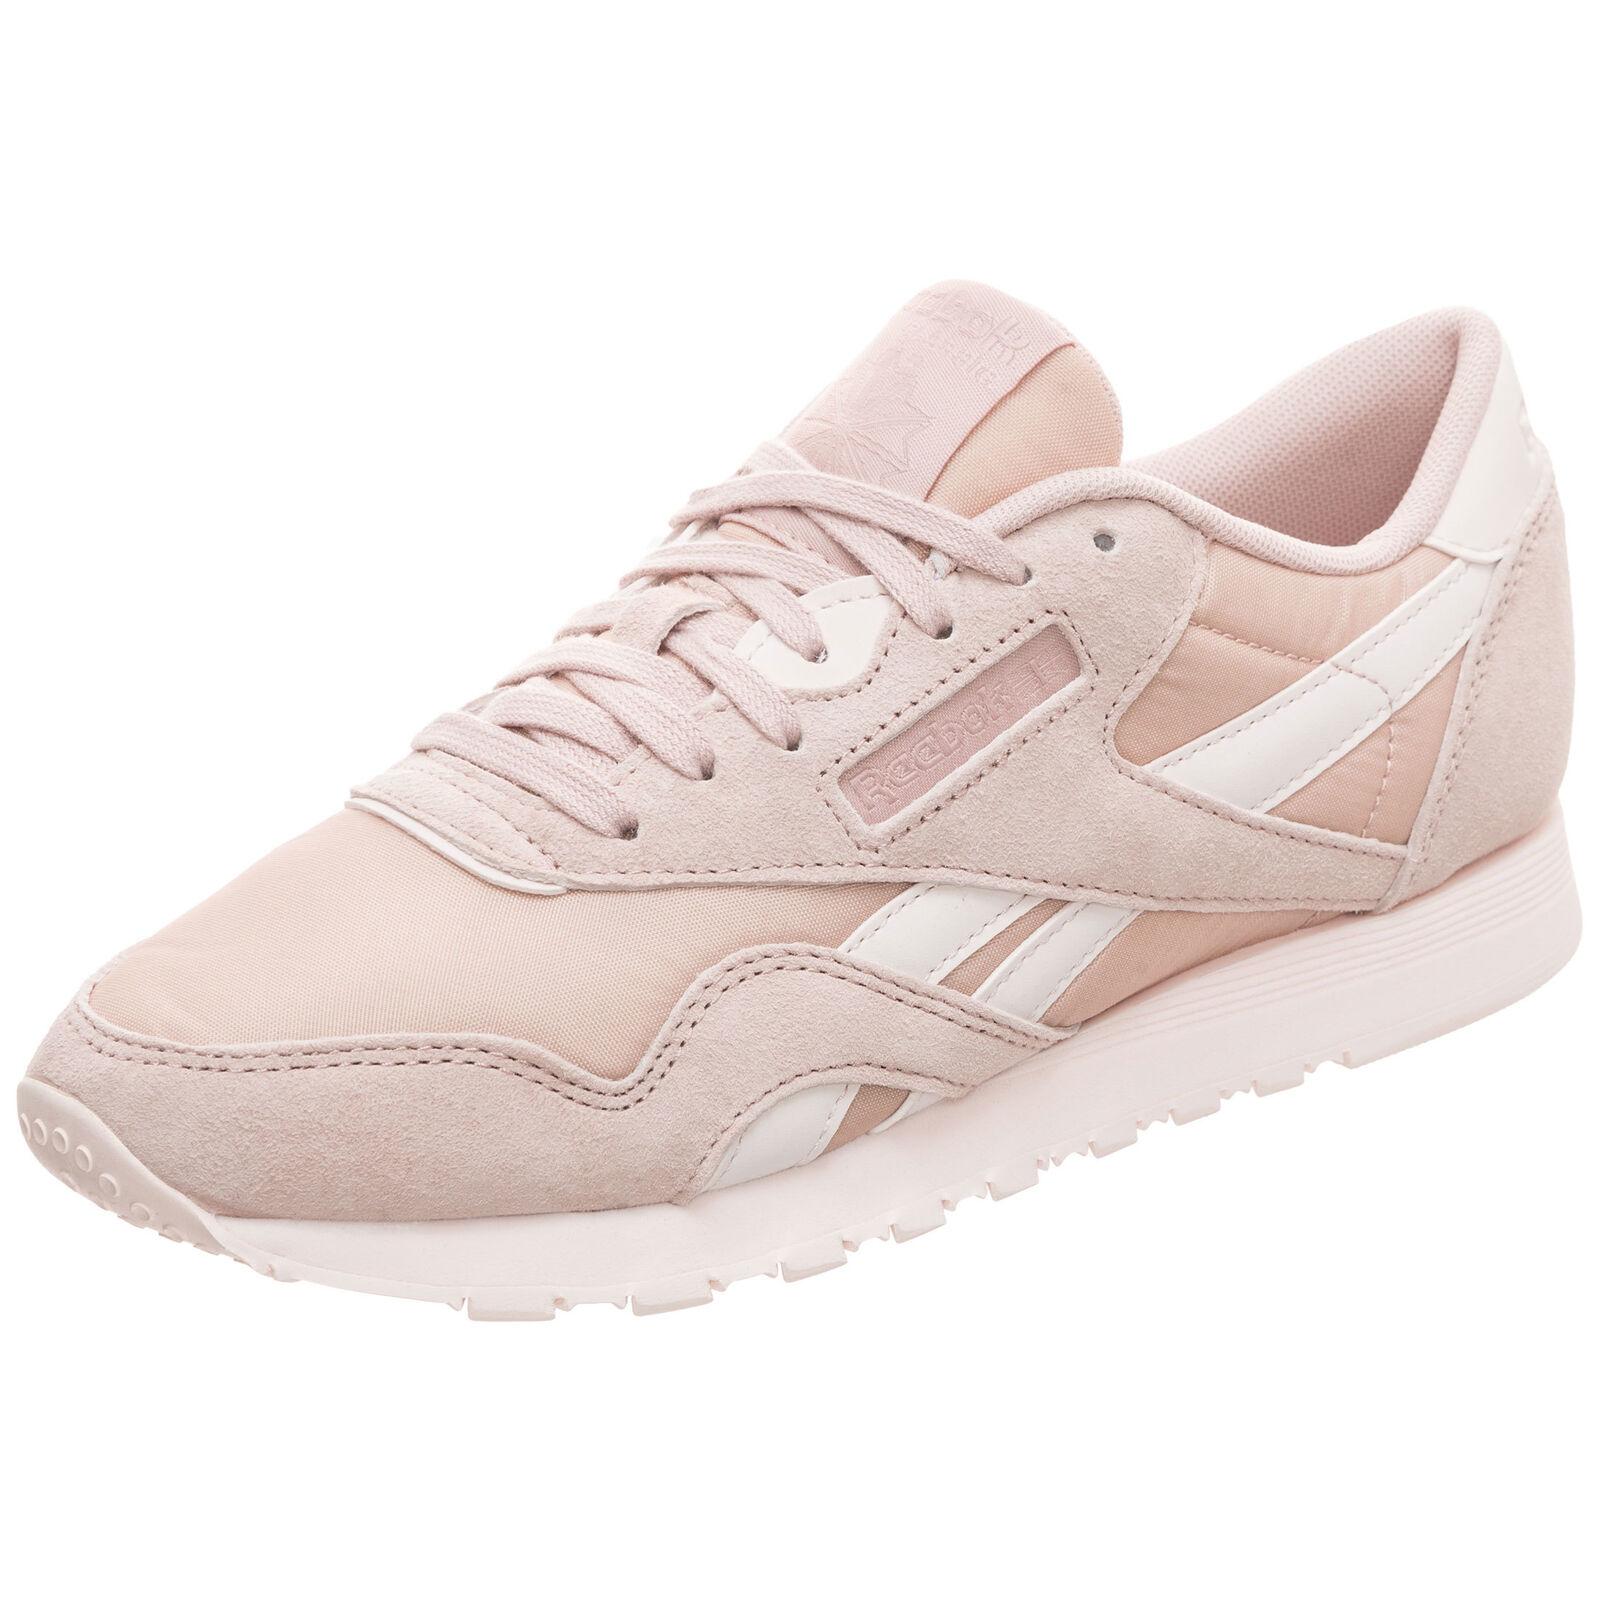 Reebok Classic Leather Nylon Turnschuhe Damen Beige NEU Schuhe Turnschuhe